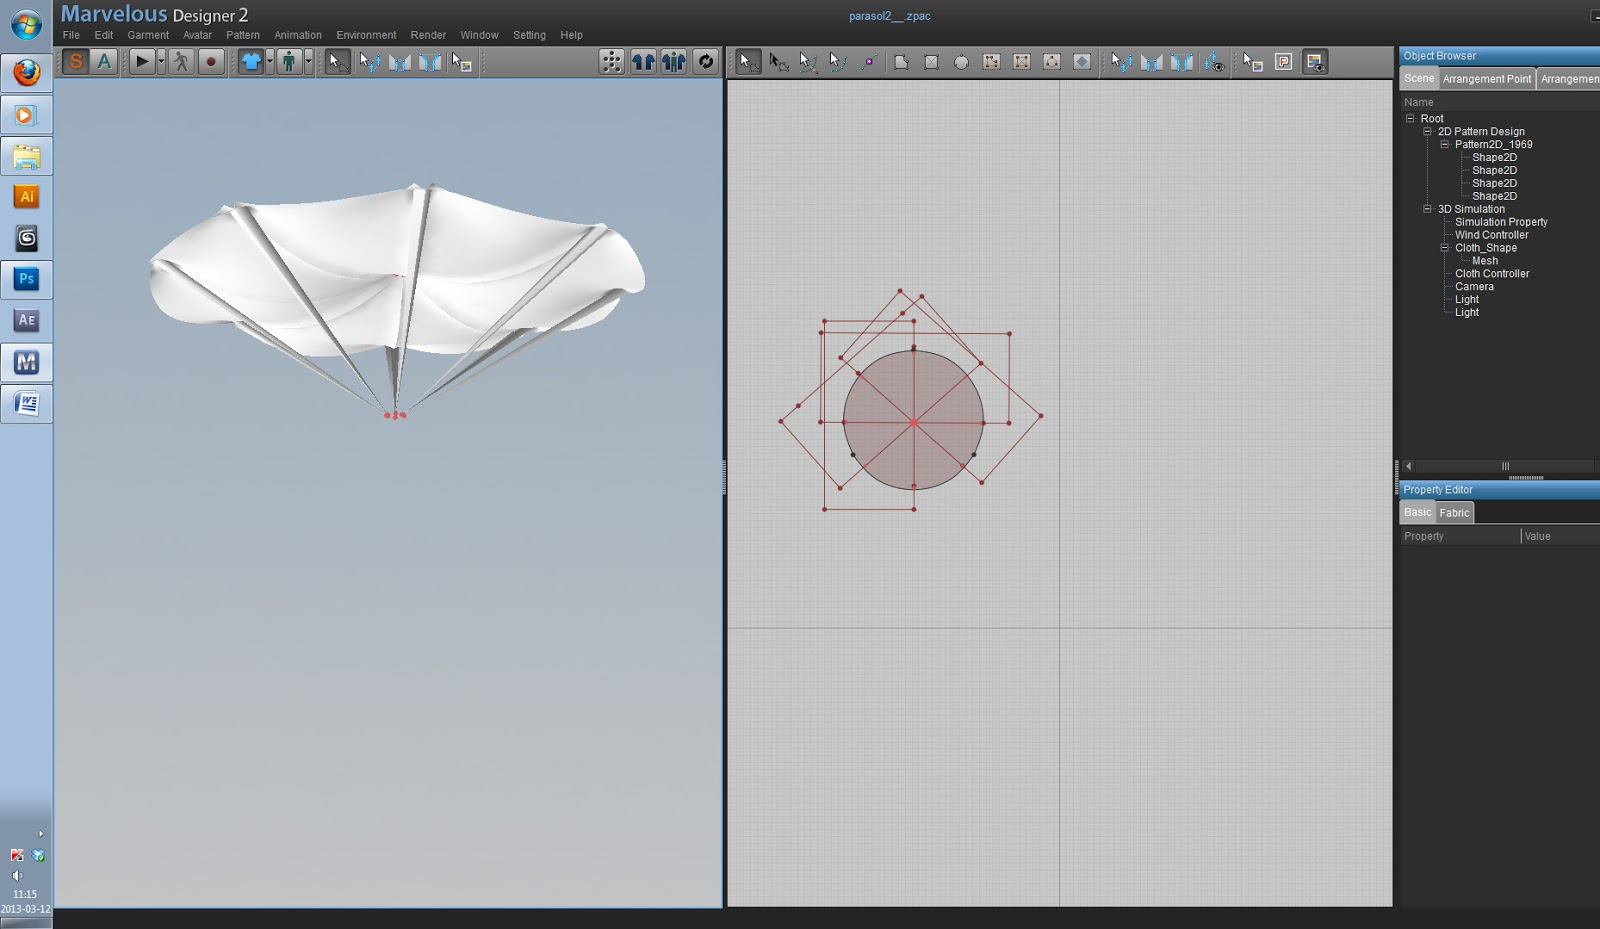 Marvelous Designer tutorial: Modeling an Umbrella   CG TUTORIAL